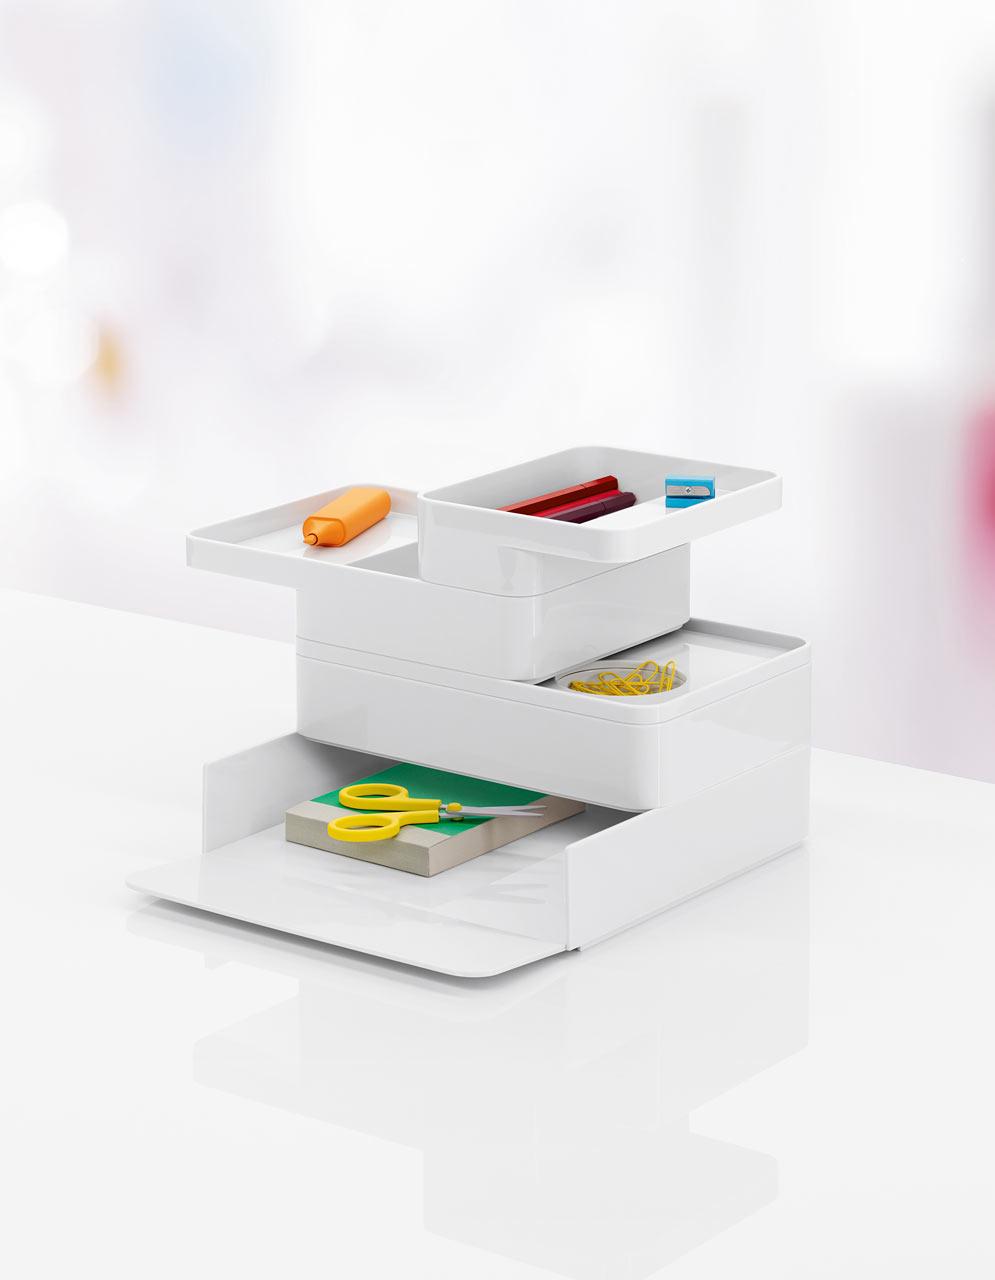 Formwork-Desk-Herman-Miller-4